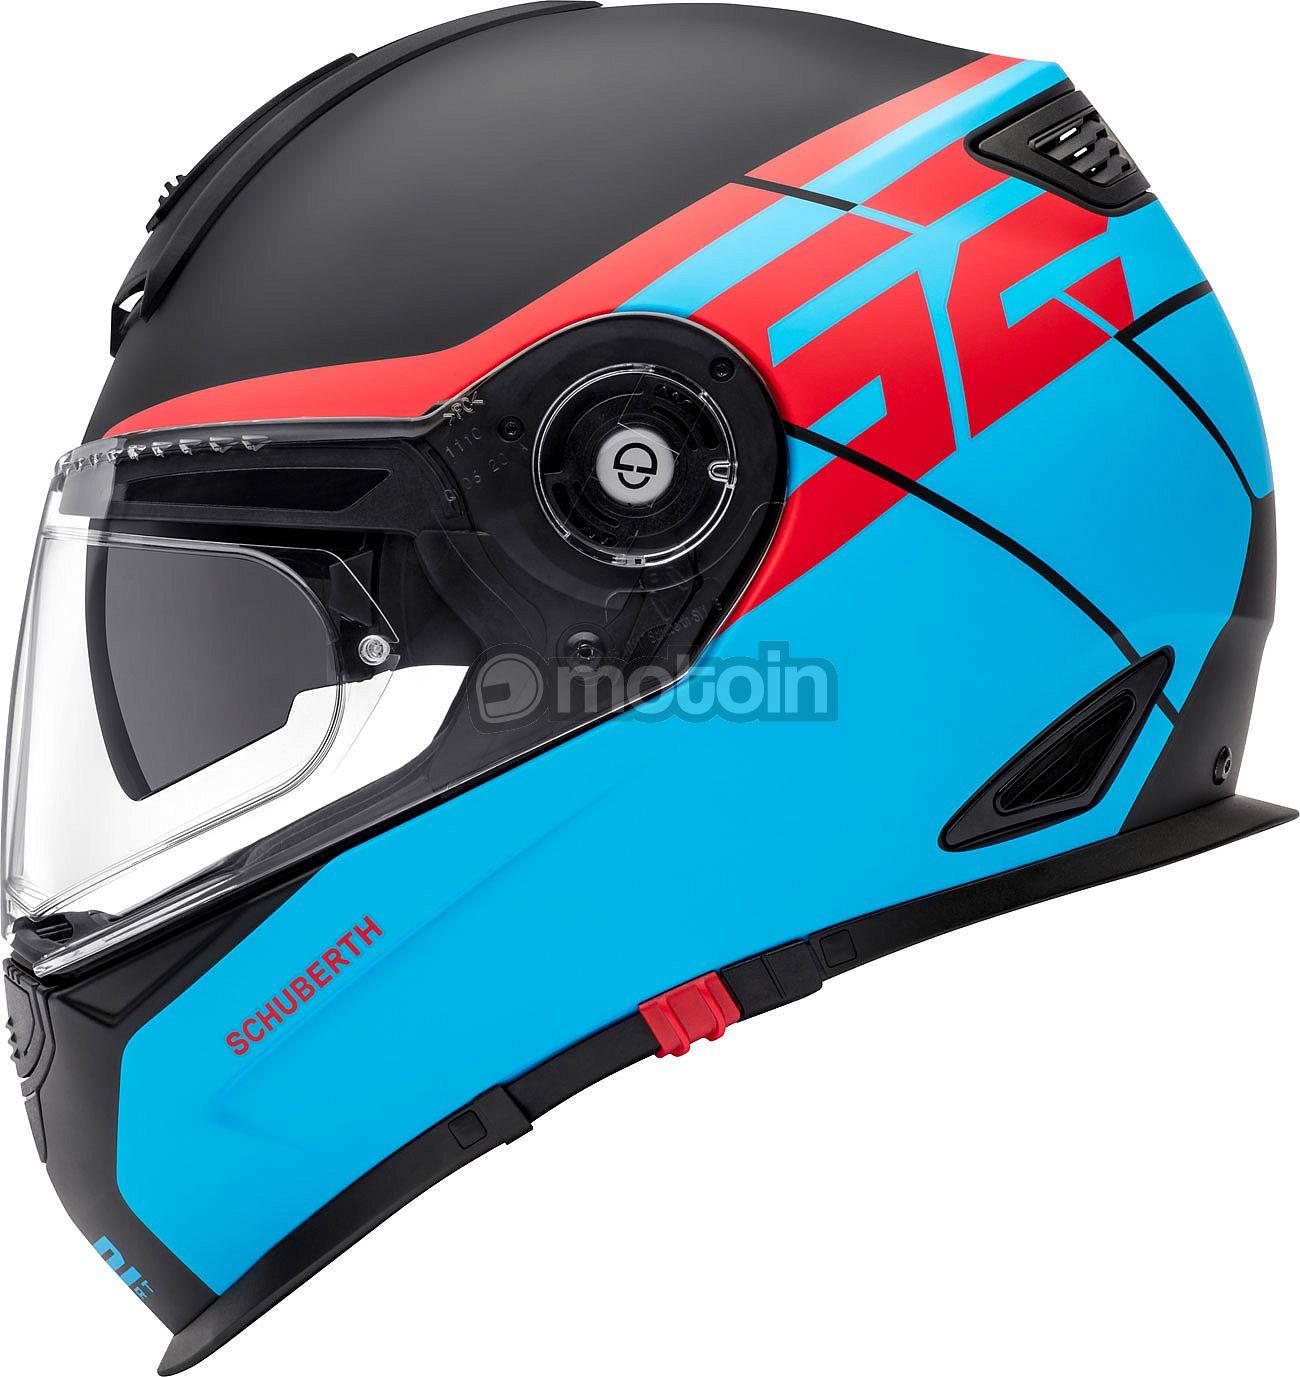 schuberth s2 sport rush integral helmet. Black Bedroom Furniture Sets. Home Design Ideas